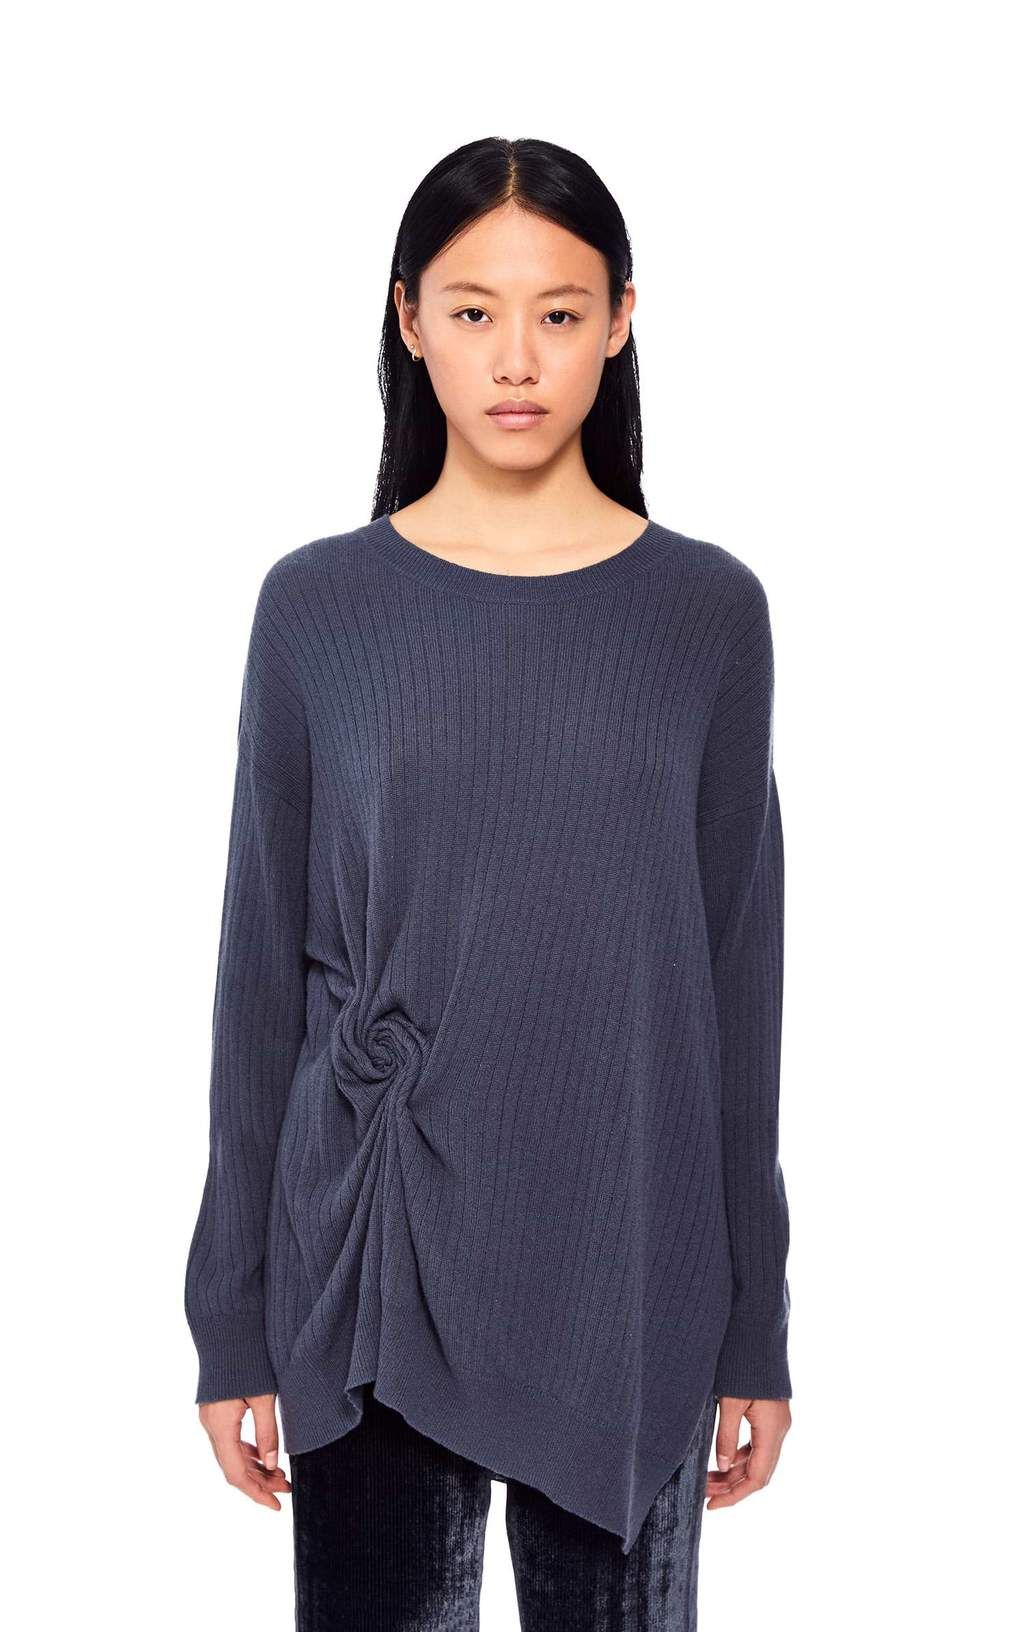 3486cc8d9dac Brynn Cashmere Rosette Sweater | 19AW | Sweaters, Cashmere, Knitwear